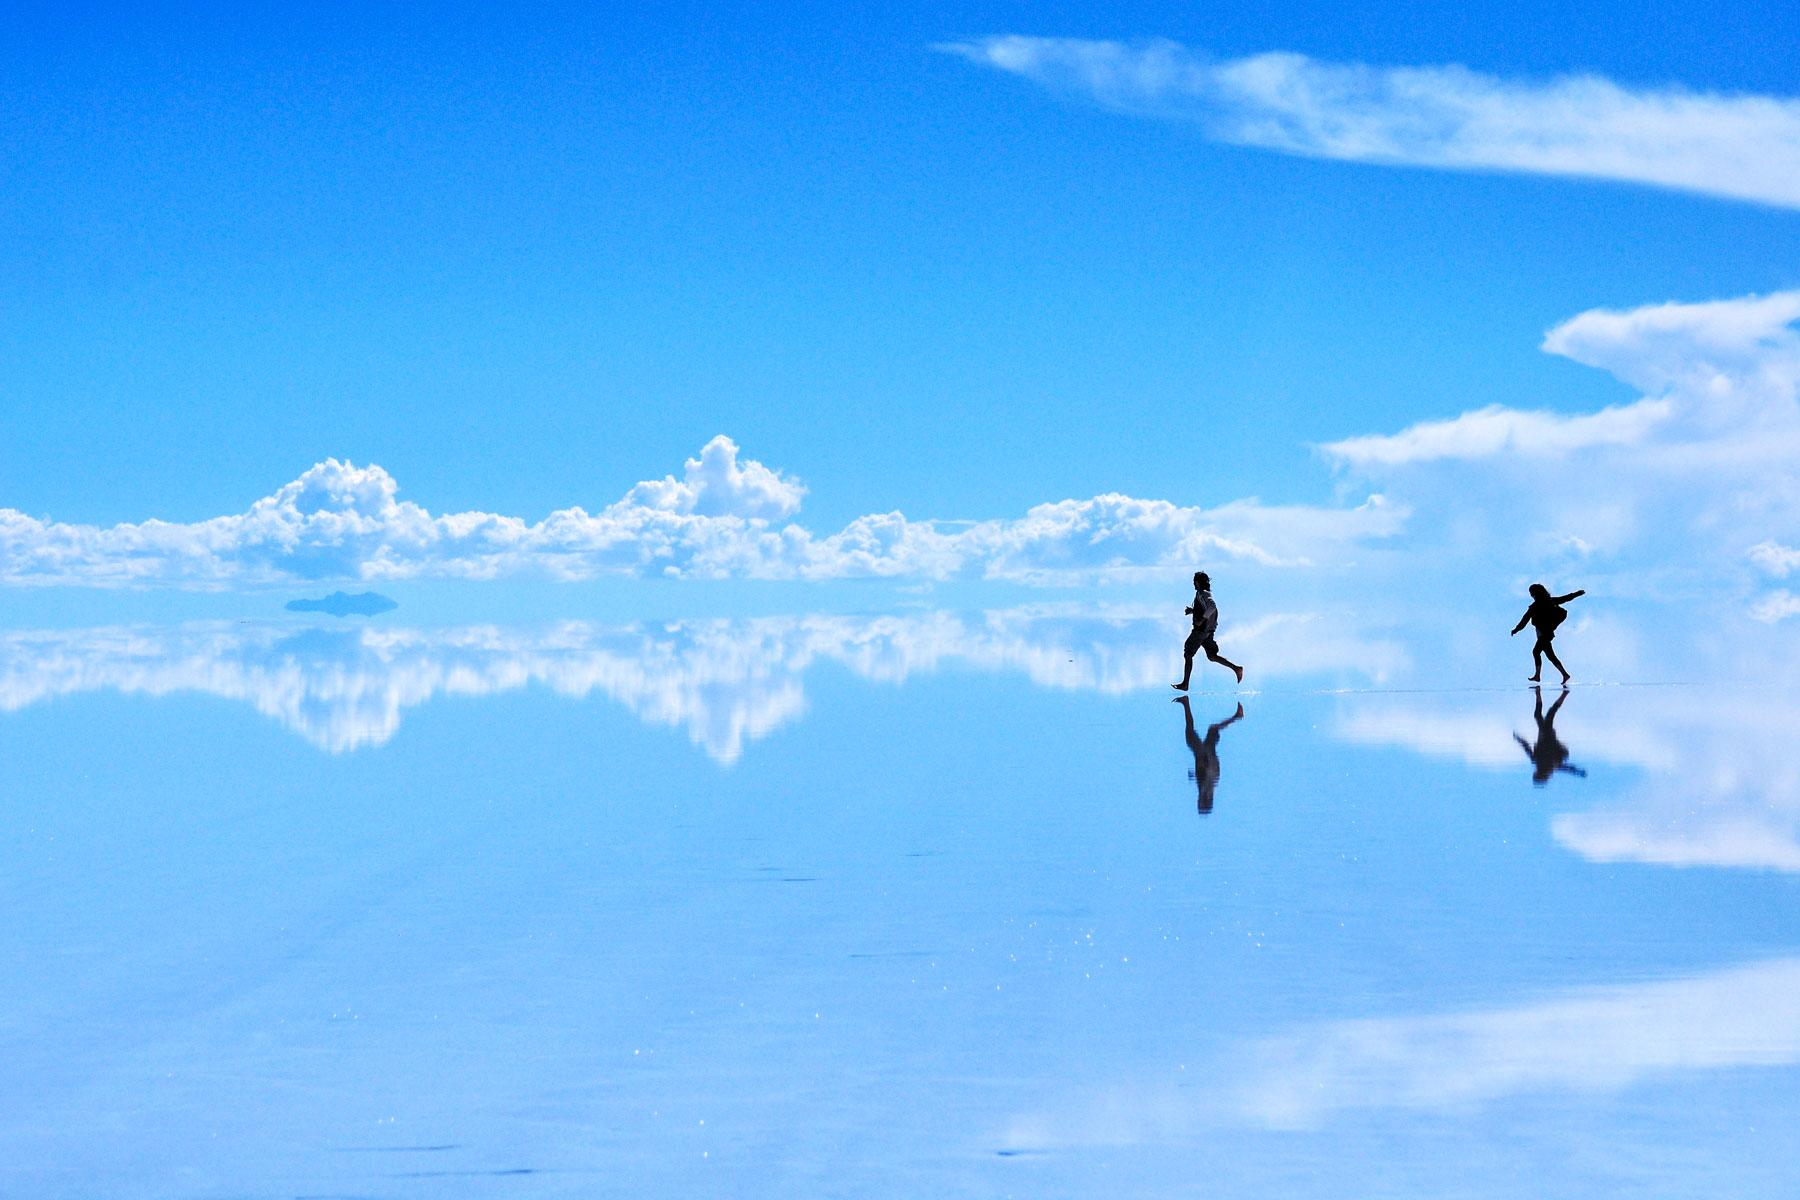 Bolivia S Salar De Uyuni Salt Flats Are Incredible Looking